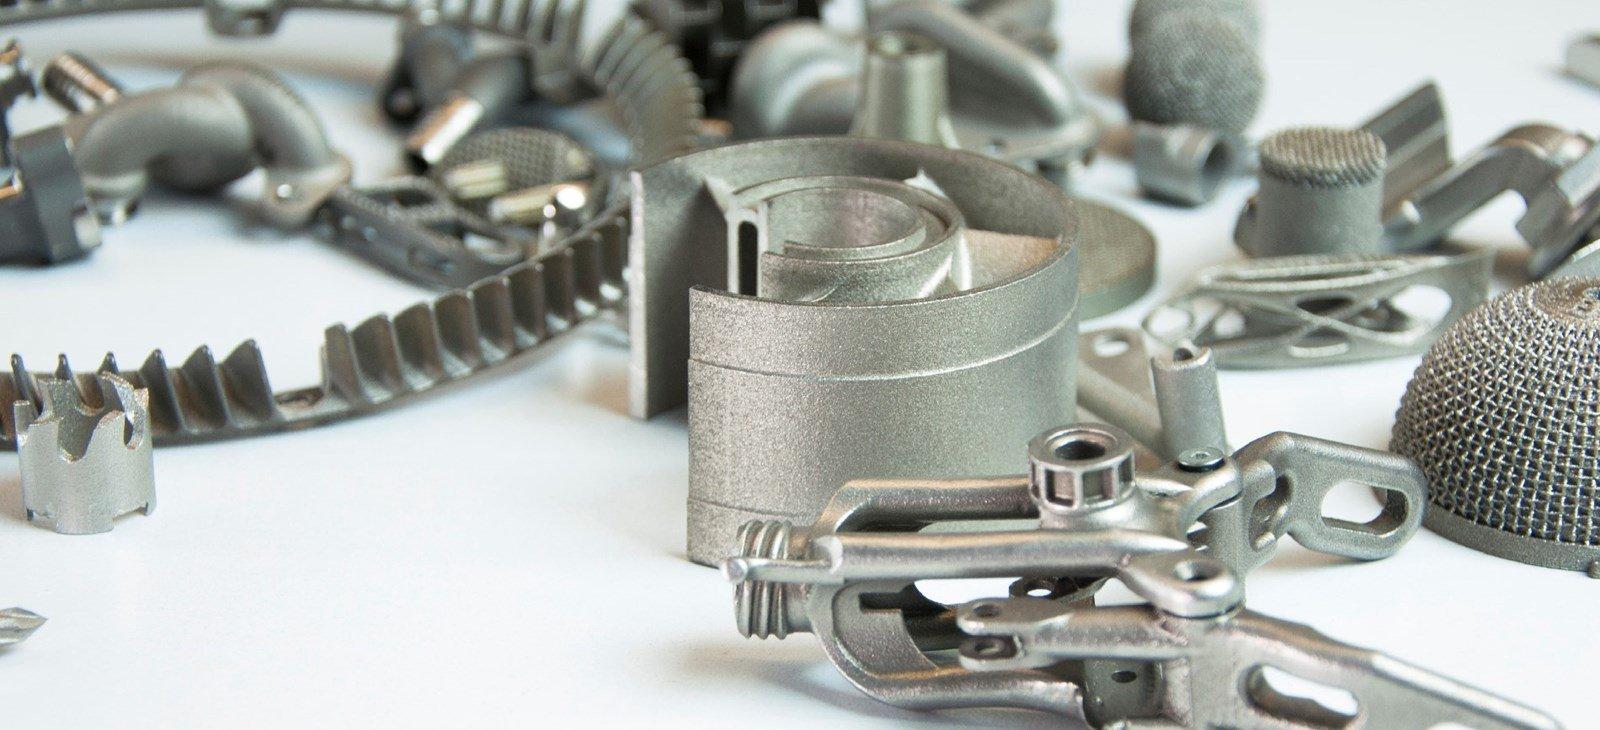 Metal 3D printed part from Beam IT. Photo via Beam IT